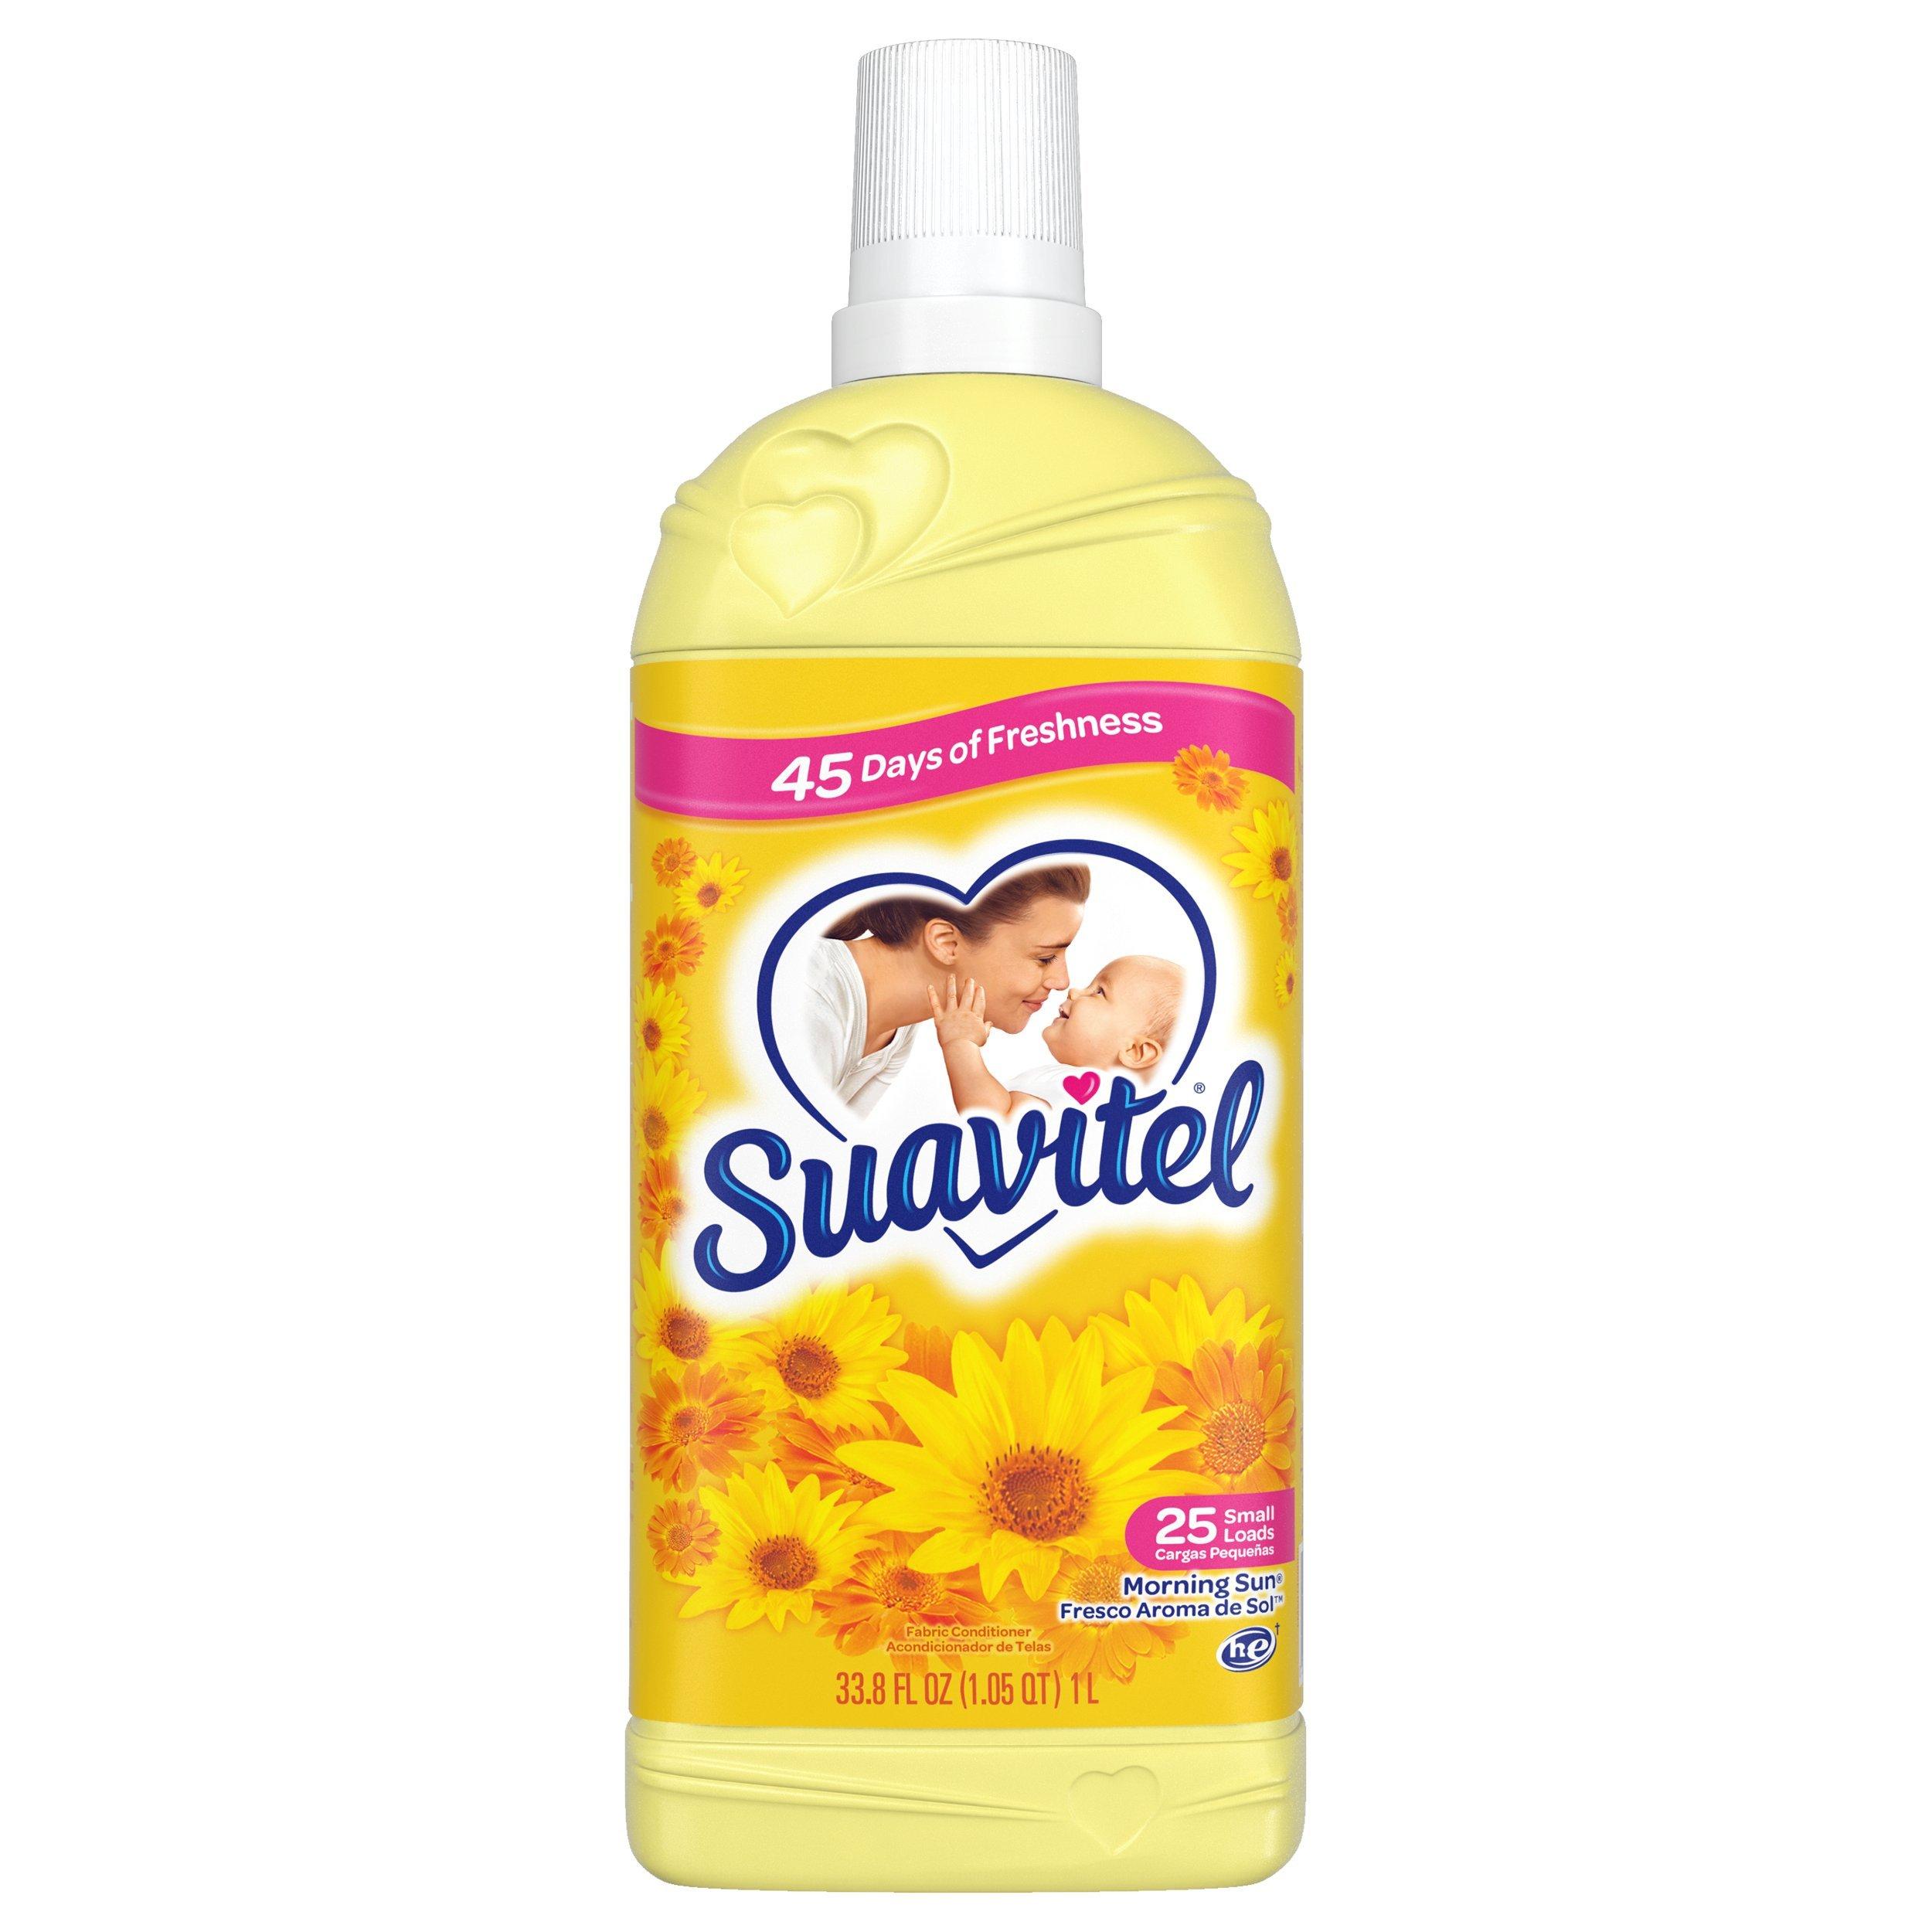 Suavitel Fabric Softener, Morning Sun, 33.8 Fluid Ounce